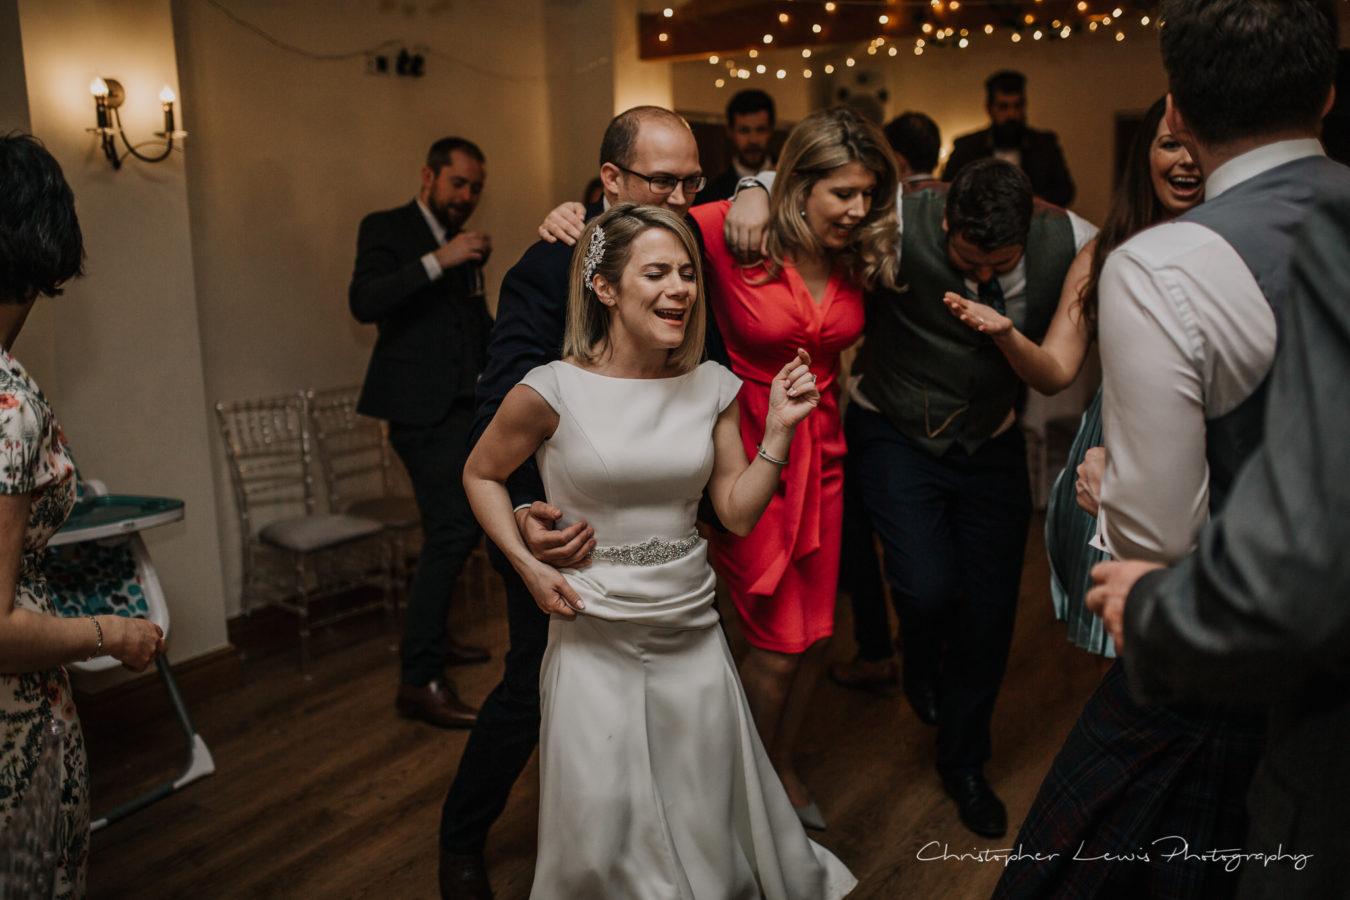 Thief-Hall-Wedding-Christopher-Lewis-Photography-92